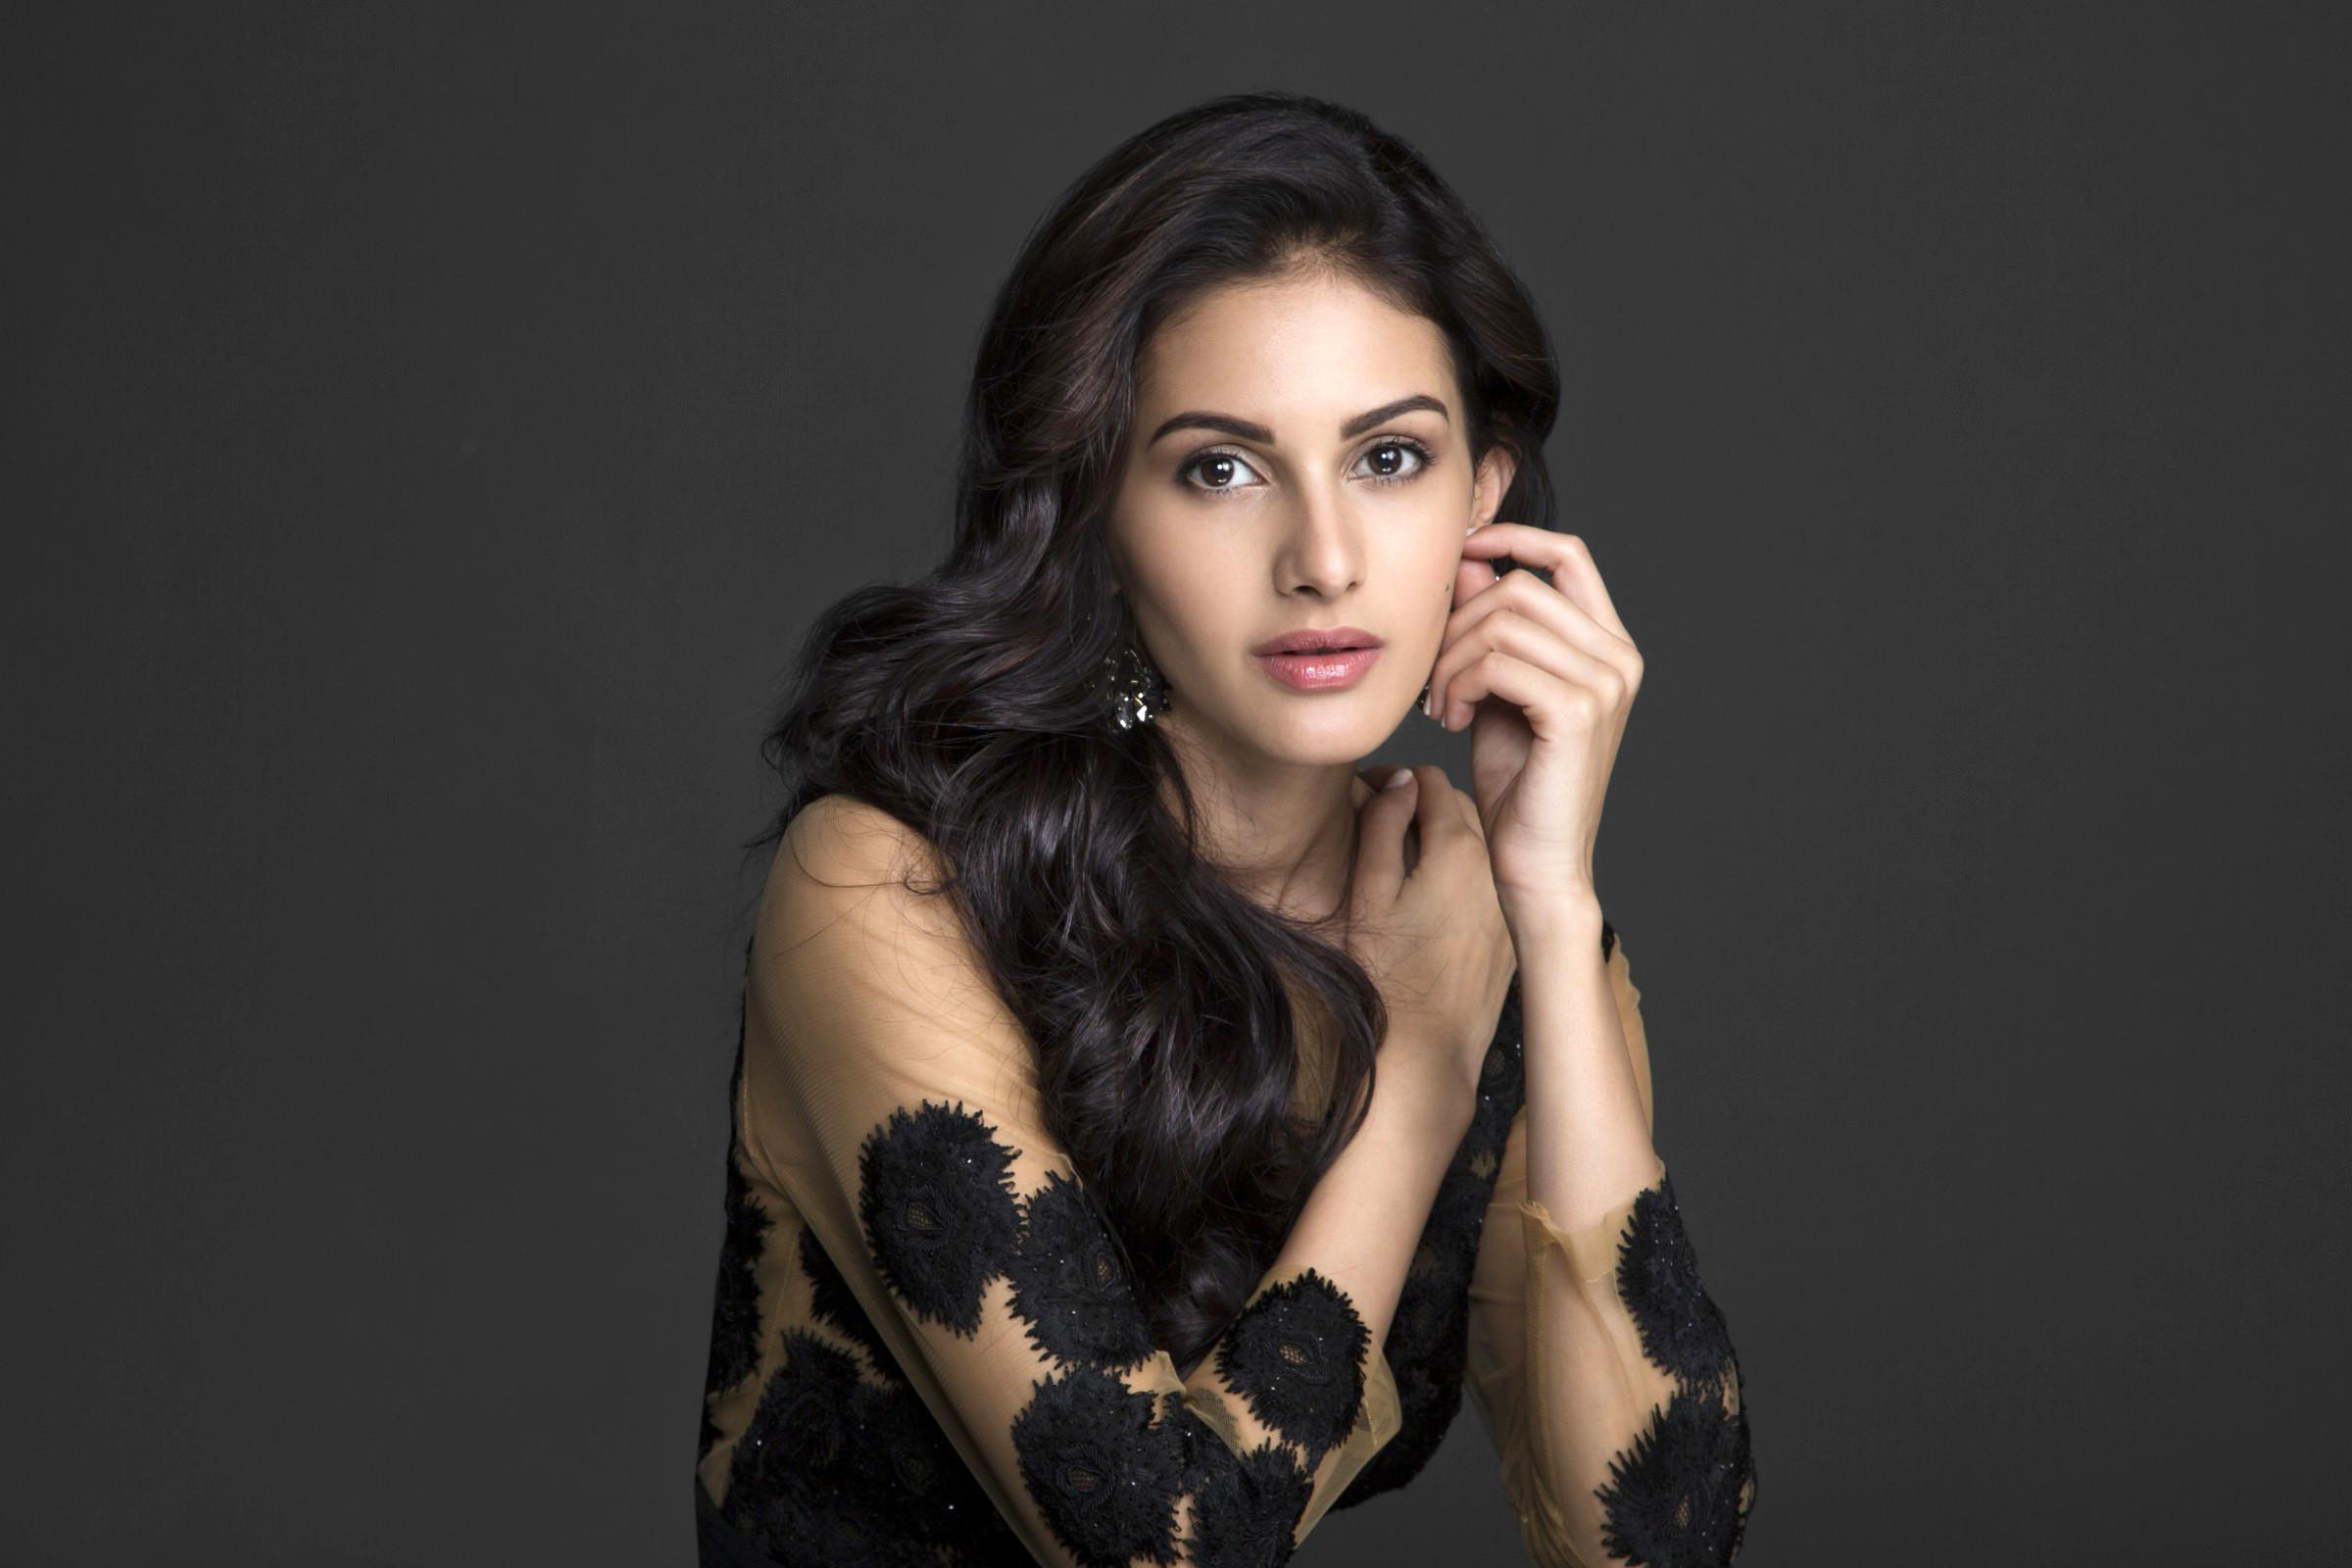 Bollywood Actress Wallpaper HD 2018 (74+ images)